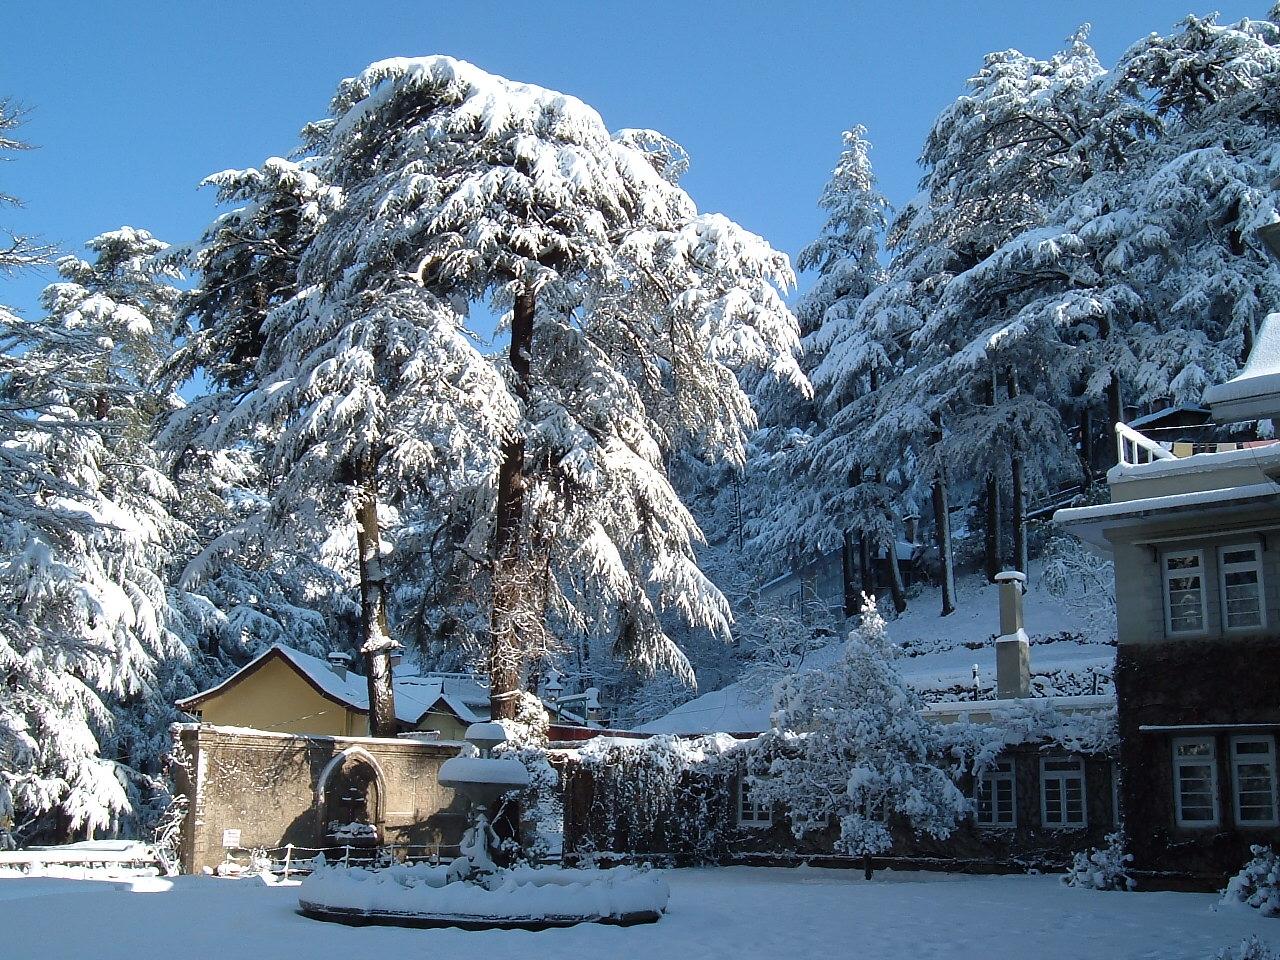 http://1.bp.blogspot.com/-I7RpWfIERyQ/TbEiVvqw3PI/AAAAAAAAAc0/YSz-U_5HXm8/s1600/Shimla-Resorts.jpg